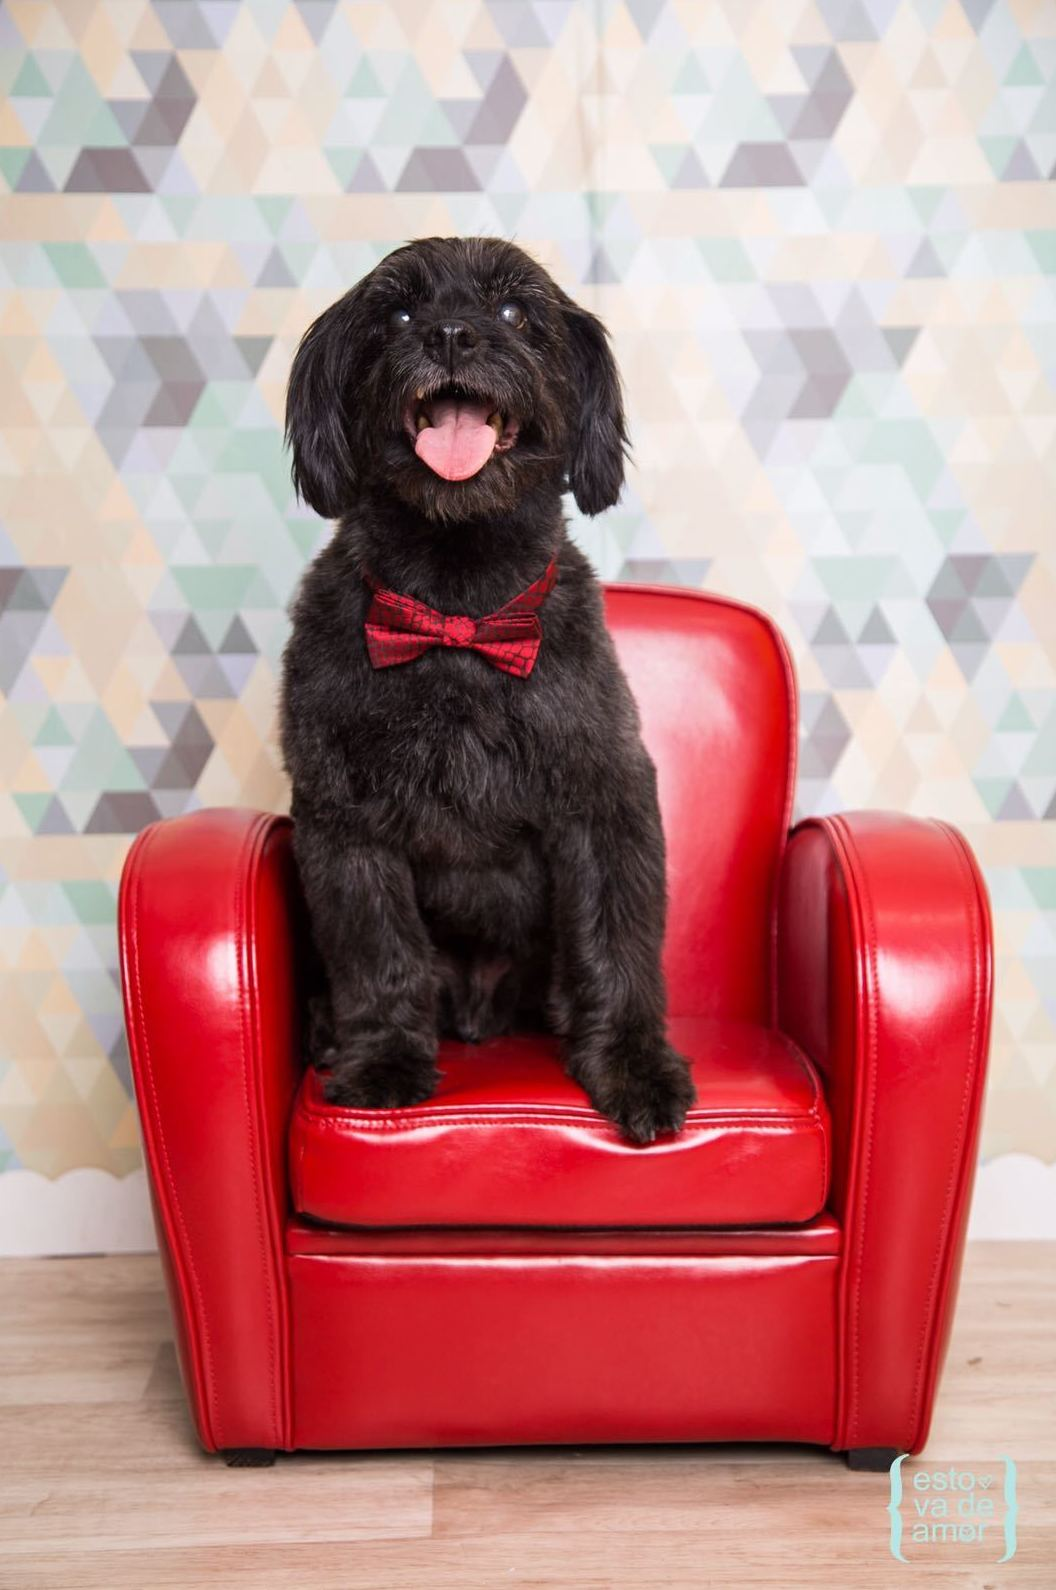 Estetica Canina Sants